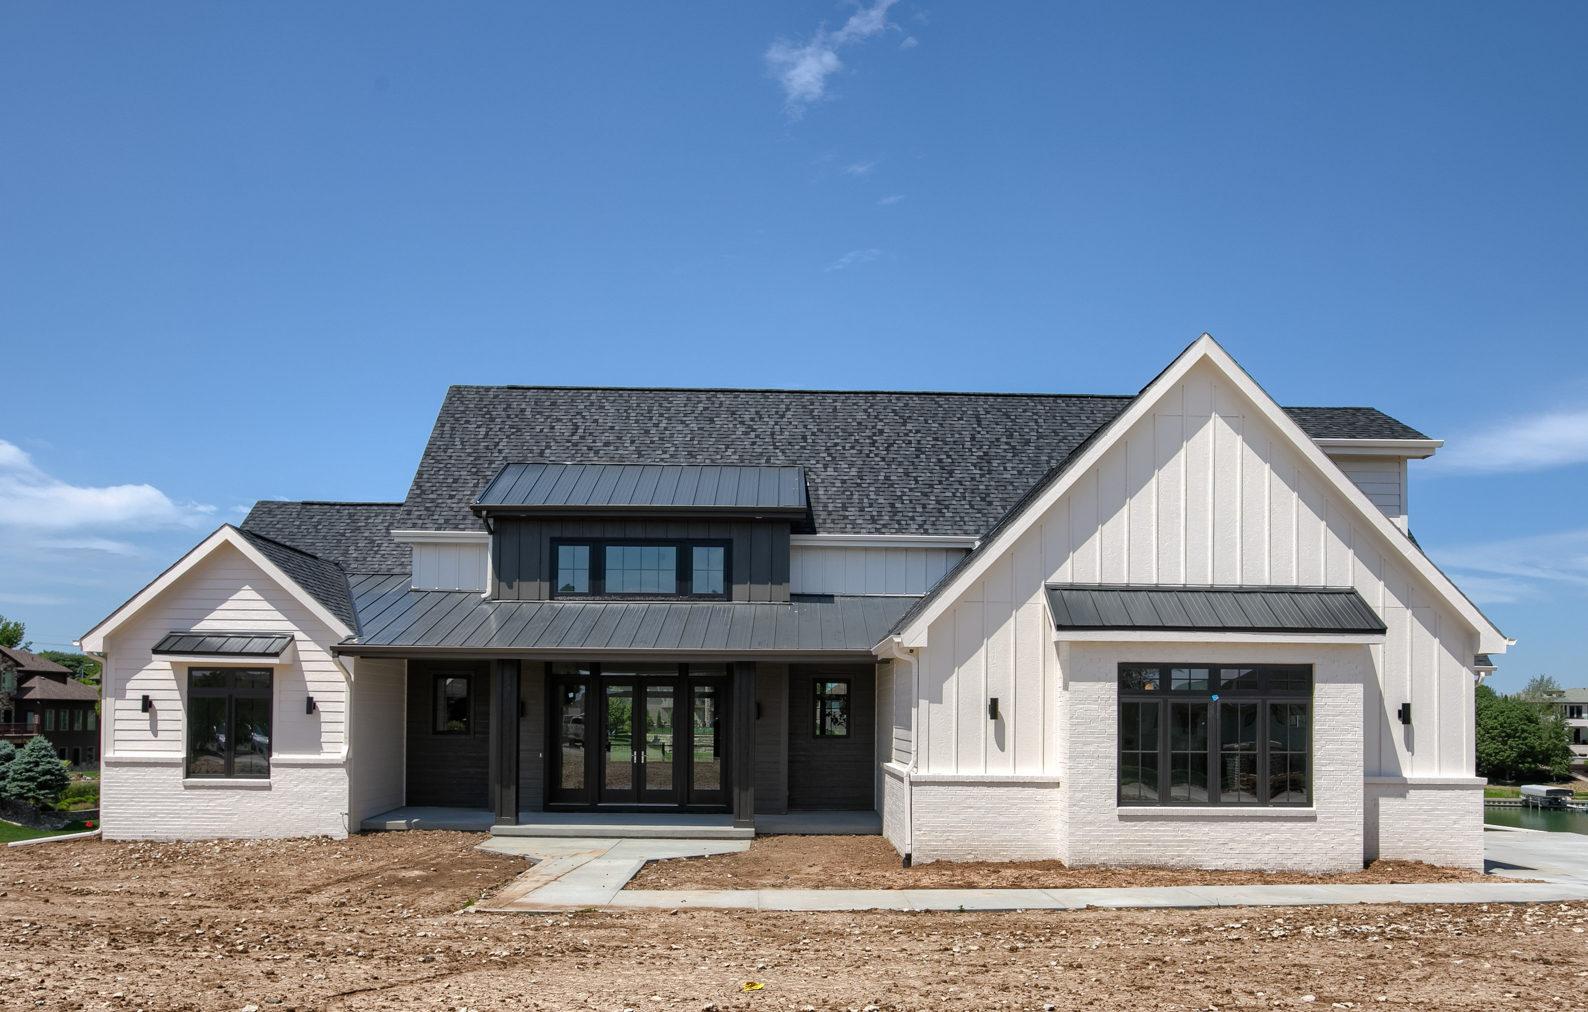 Timeless Custom Homes for Sale, Ashbury Hills, Papillion